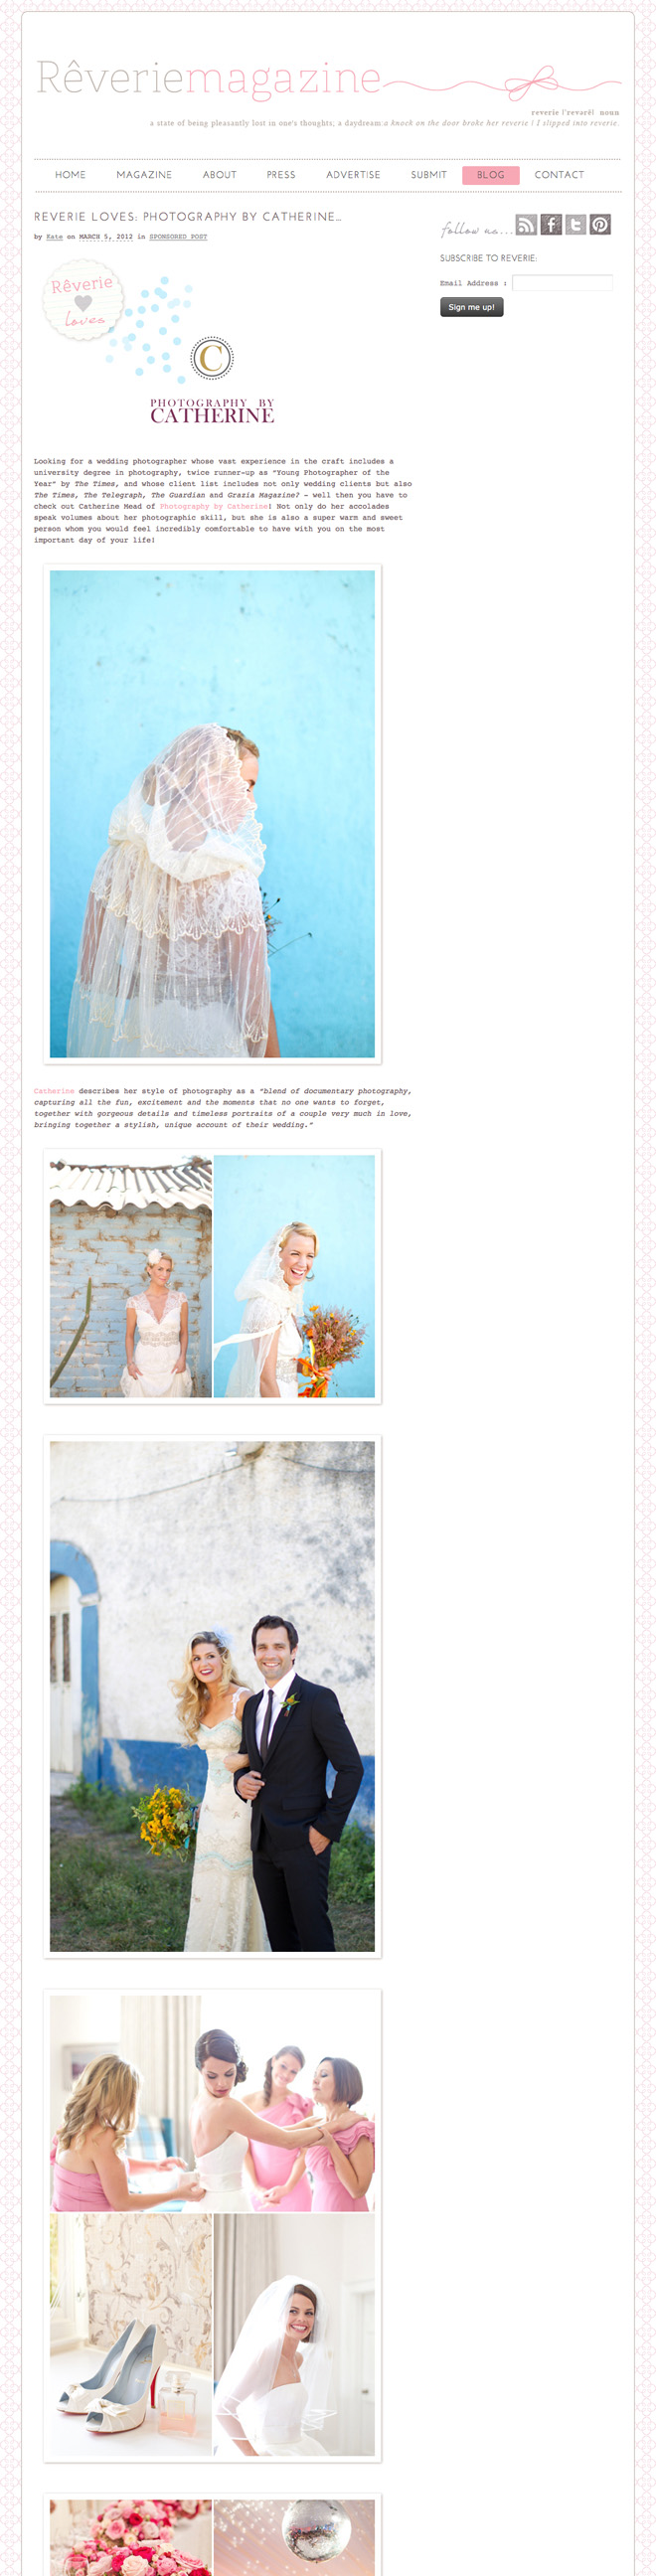 Reverie_Magazine_Photographer